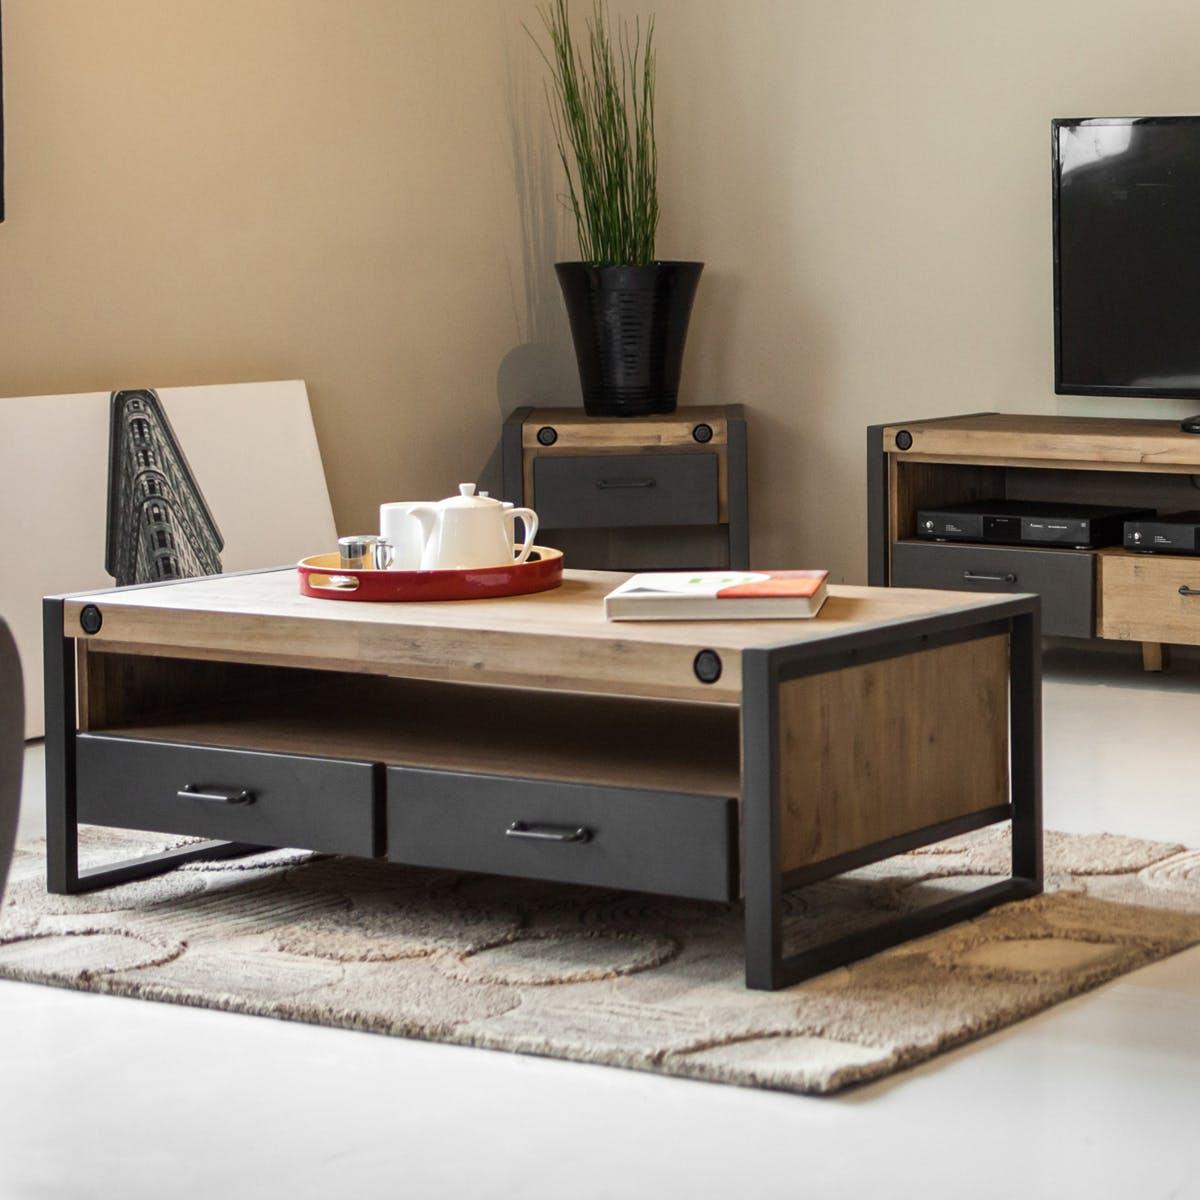 Table basse industrielle bois métal boulons BROOKLYN